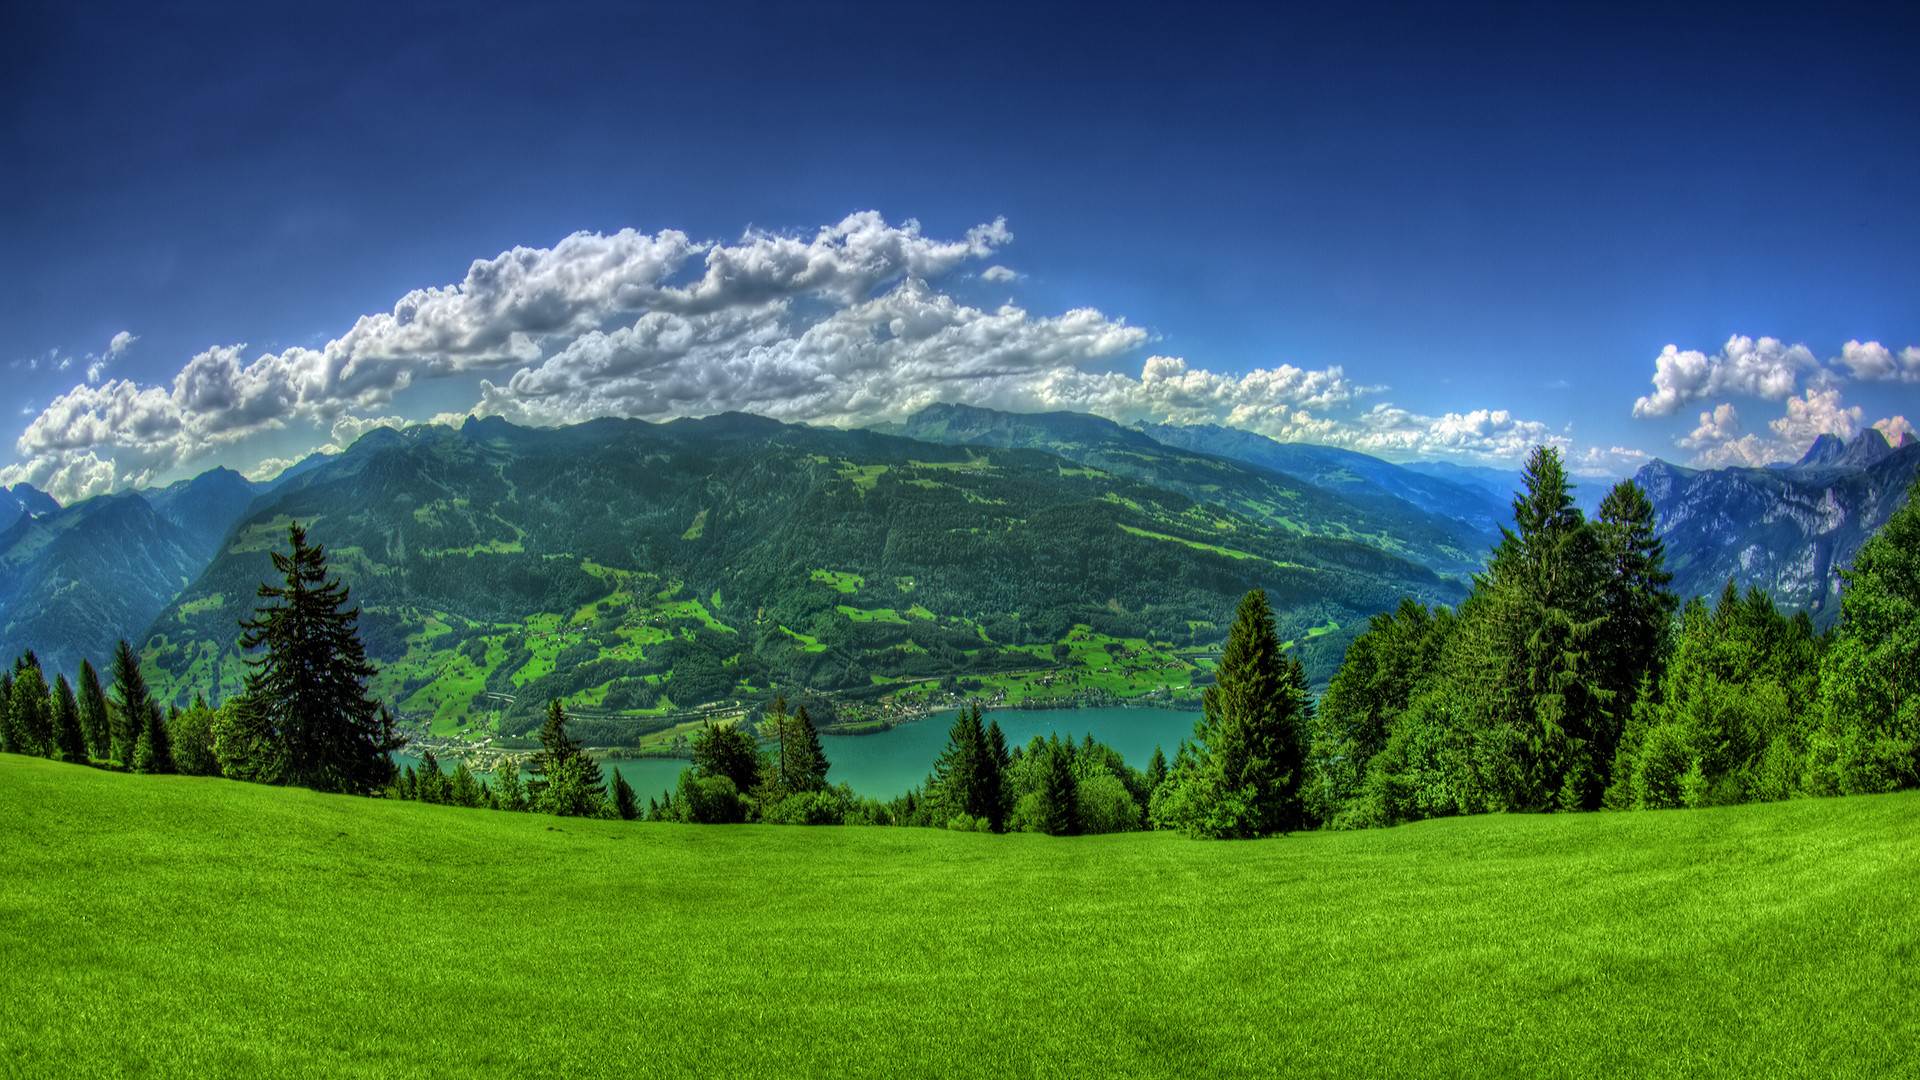 More Beautiful Nature HD Wallpaper | FLgrx Graphics